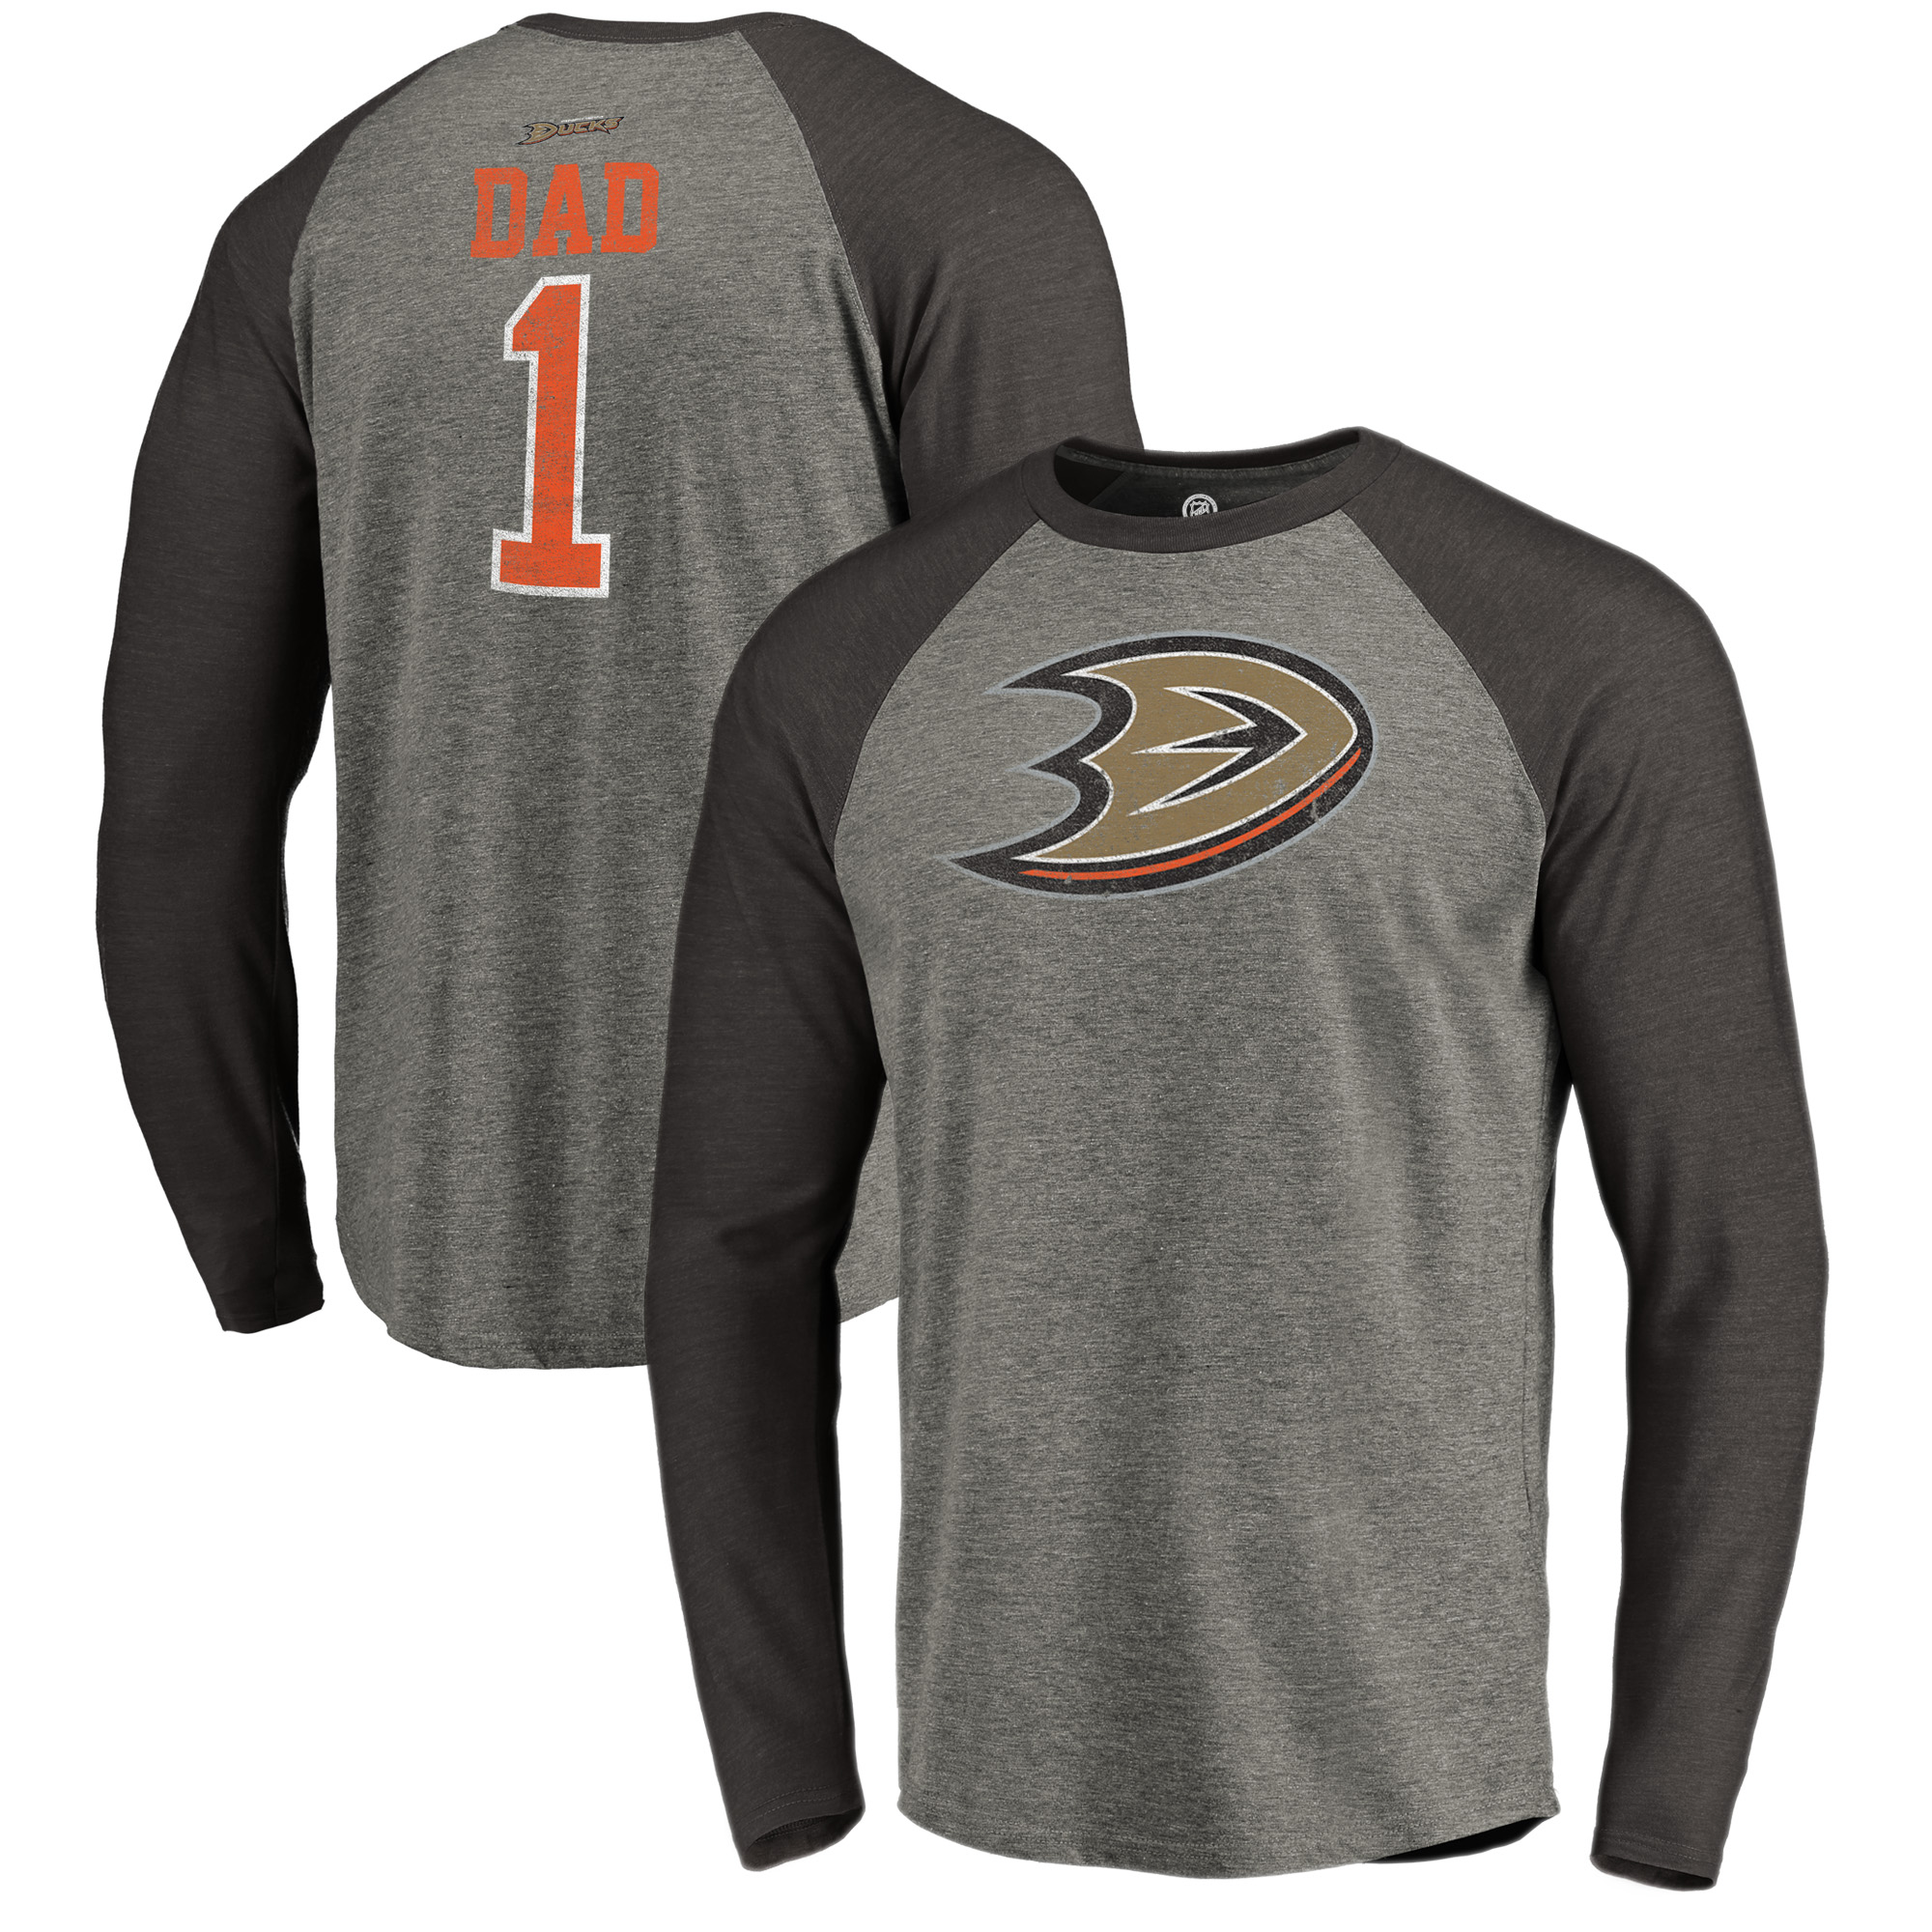 Anaheim Ducks Fanatics Branded Father's Day Greatest Dad Raglan Tri-Blend Long Sleeve T-Shirt - Heathered Gray